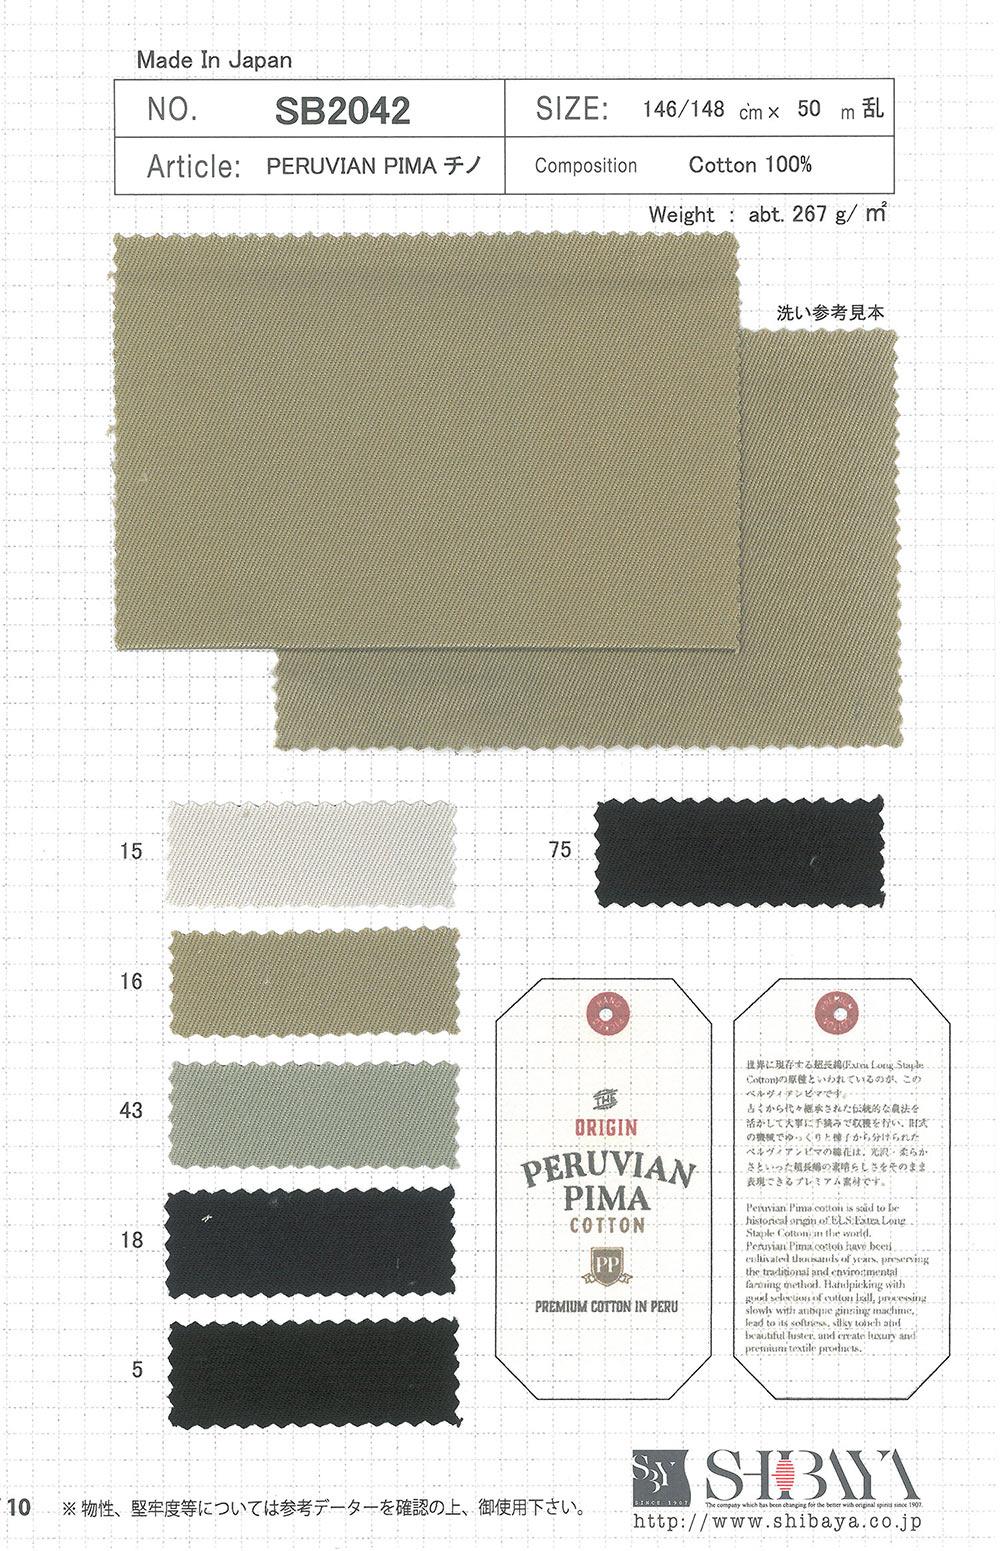 SB2042 PERUVIAN PIMA チノ[生地] 柴屋/オークラ商事 - ApparelX アパレル資材卸通販